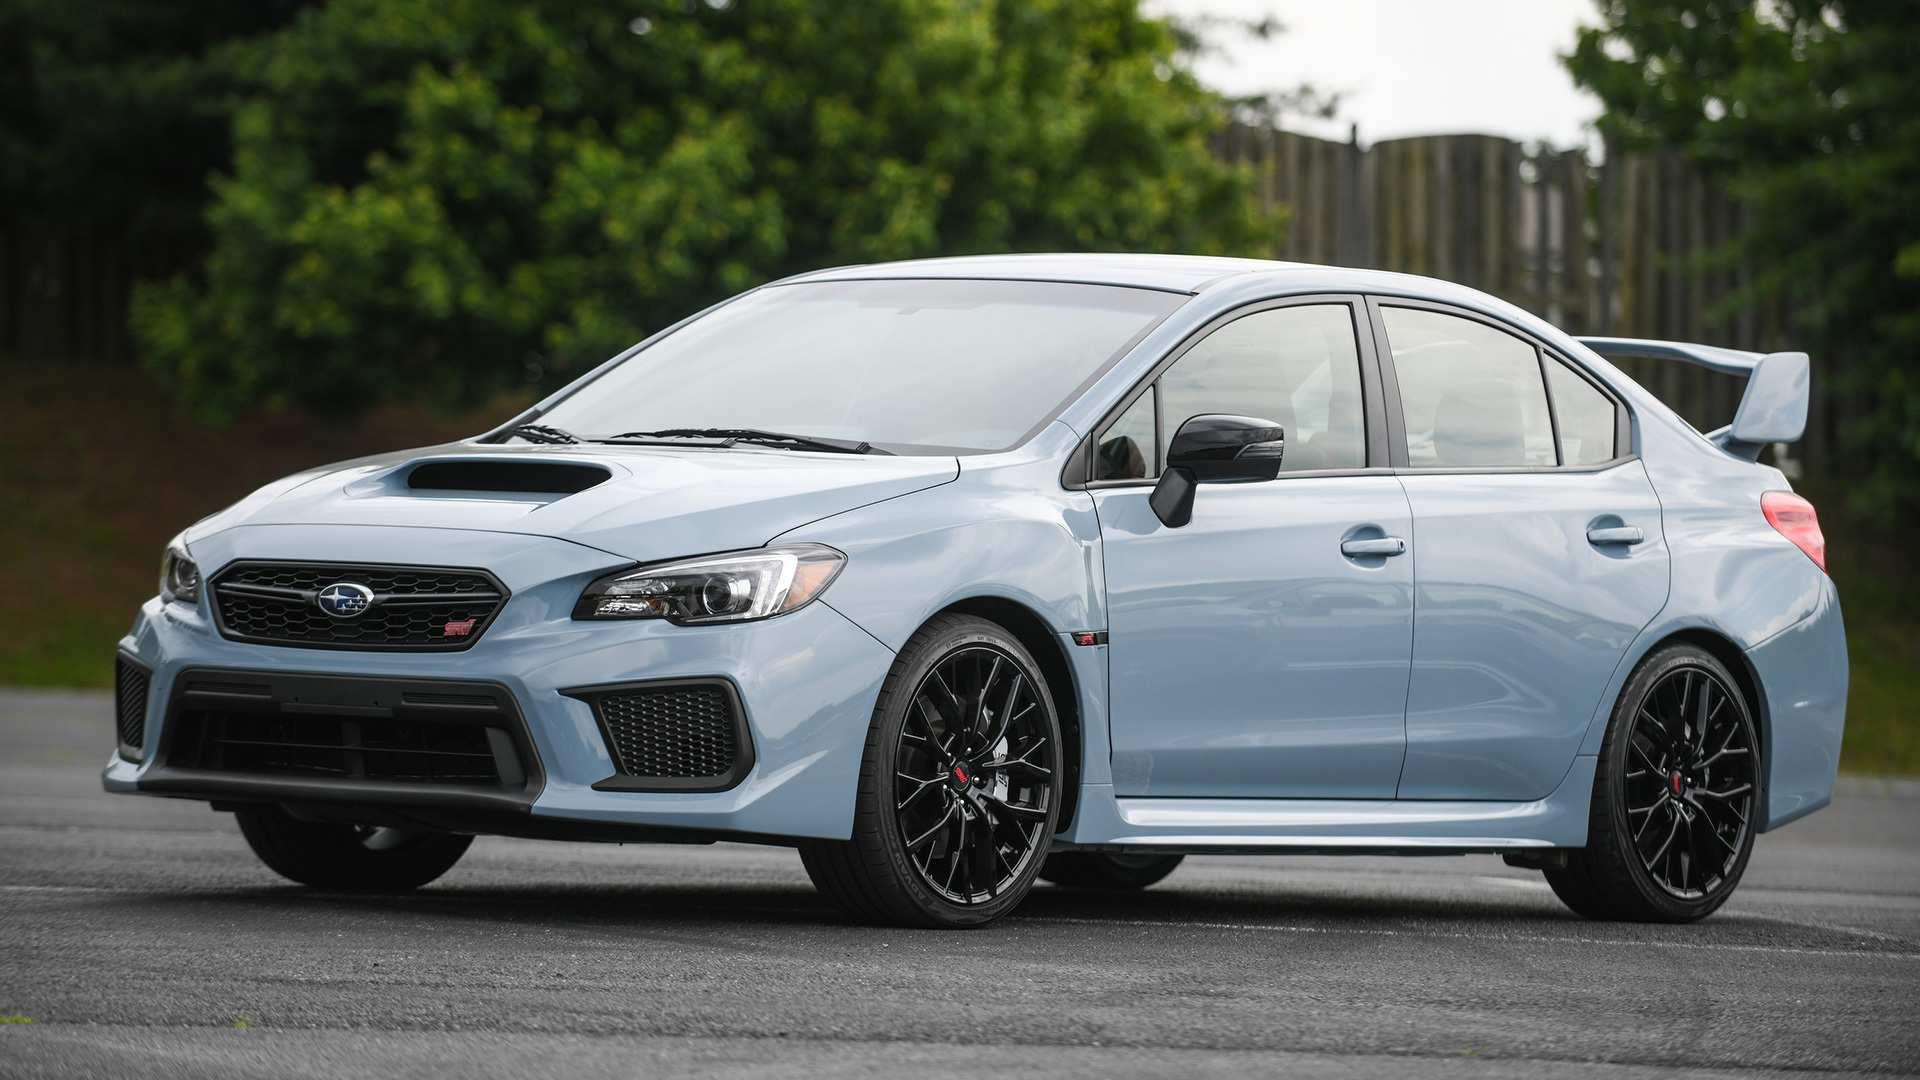 67 New 2019 Subaru Brz Sti Exterior for 2019 Subaru Brz Sti